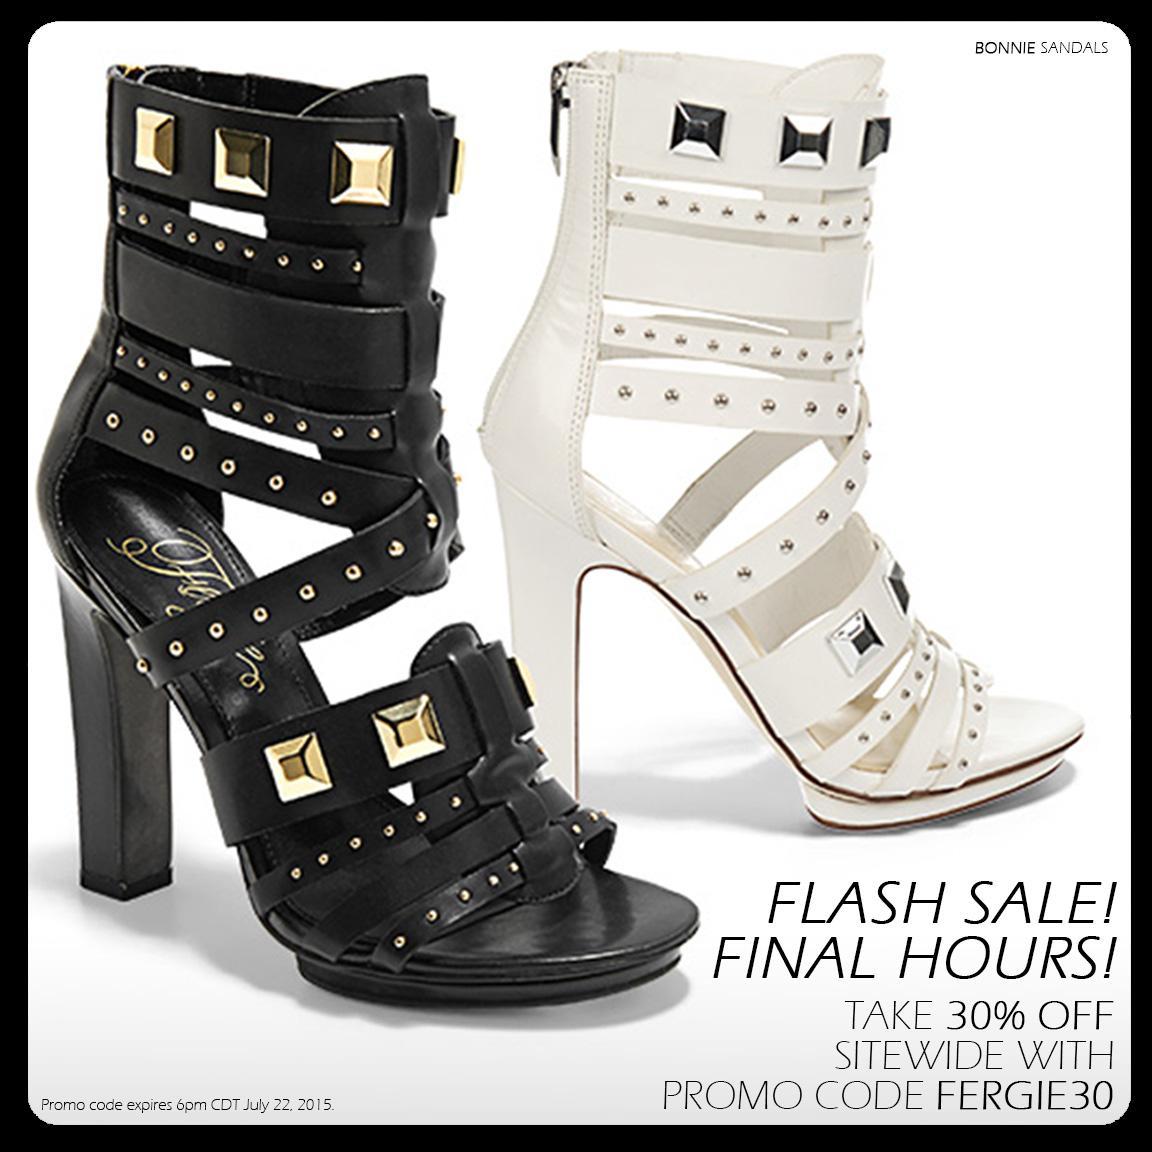 RT @FergieFootwear: ????⌛ #FlashSale! 30% OFF #Fergie #shoes sitewide w/ #promocode FERGIE30 til 6pm CDT.???????? #shoesale http://t.co/Xcjl6dMJrG h…